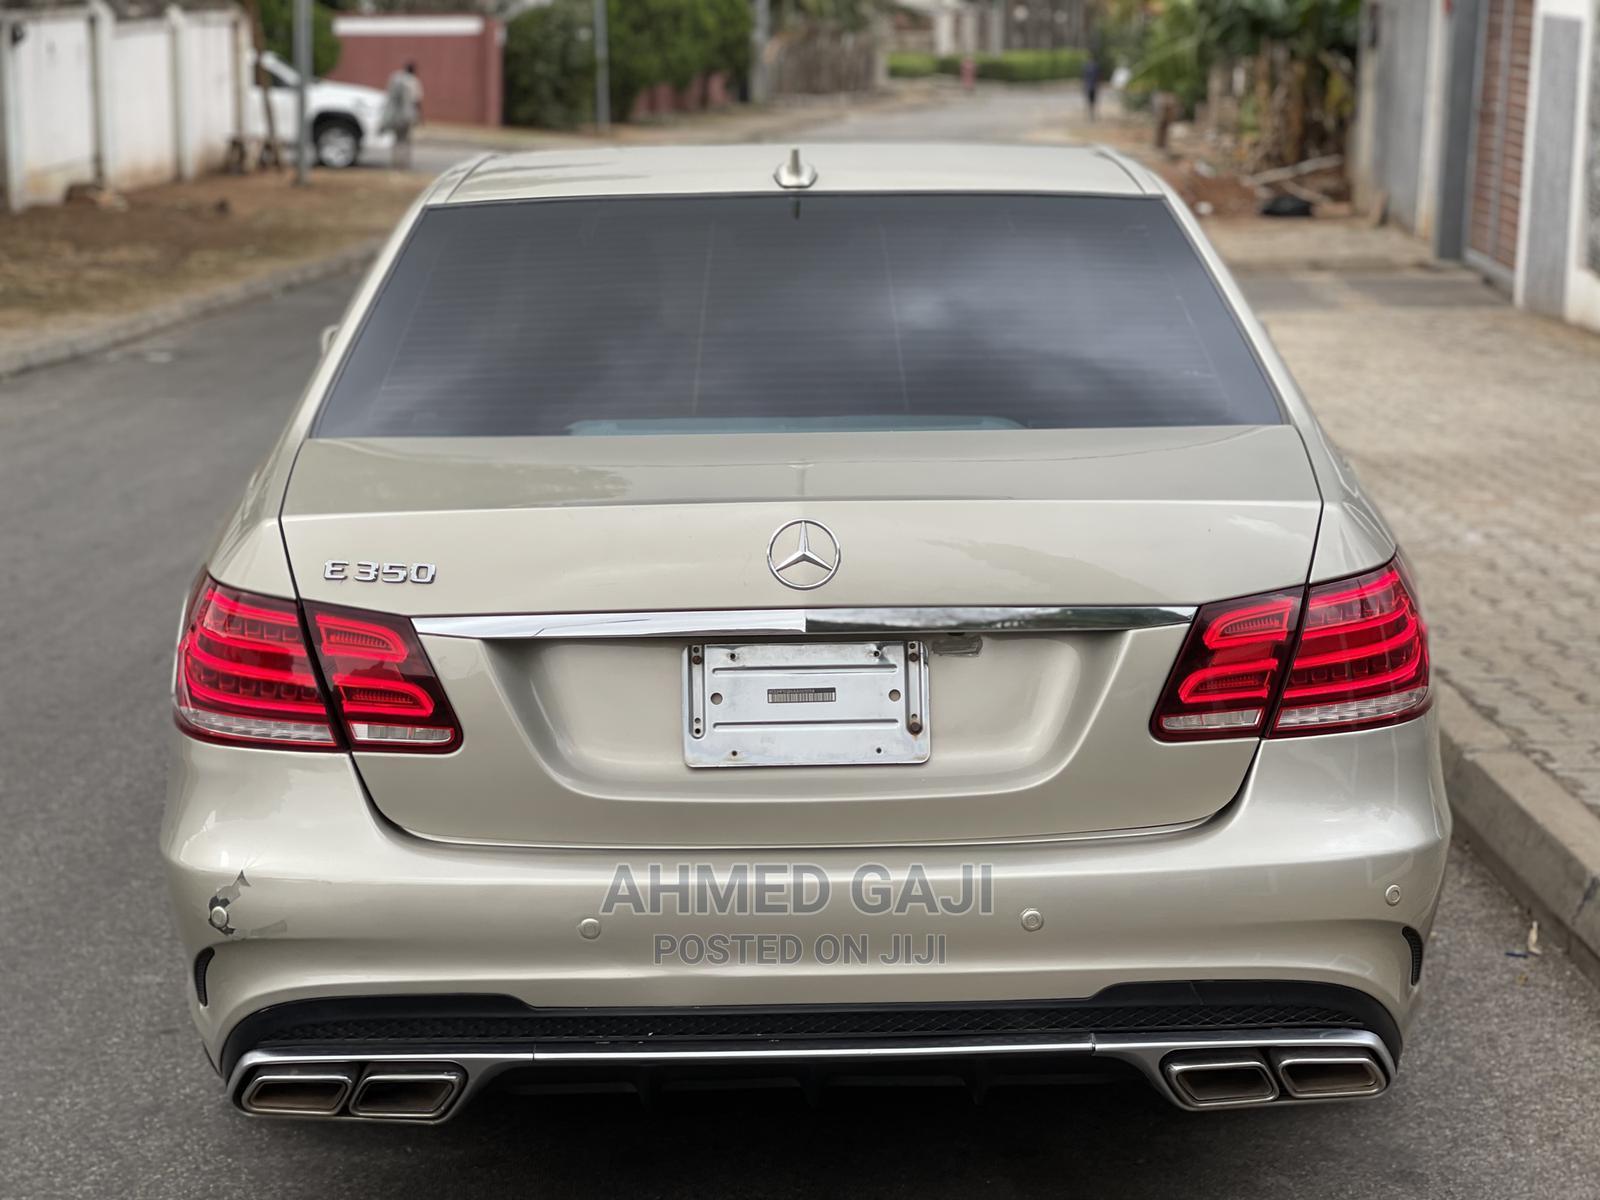 Mercedes-Benz E350 2011 Gold | Cars for sale in Asokoro, Abuja (FCT) State, Nigeria